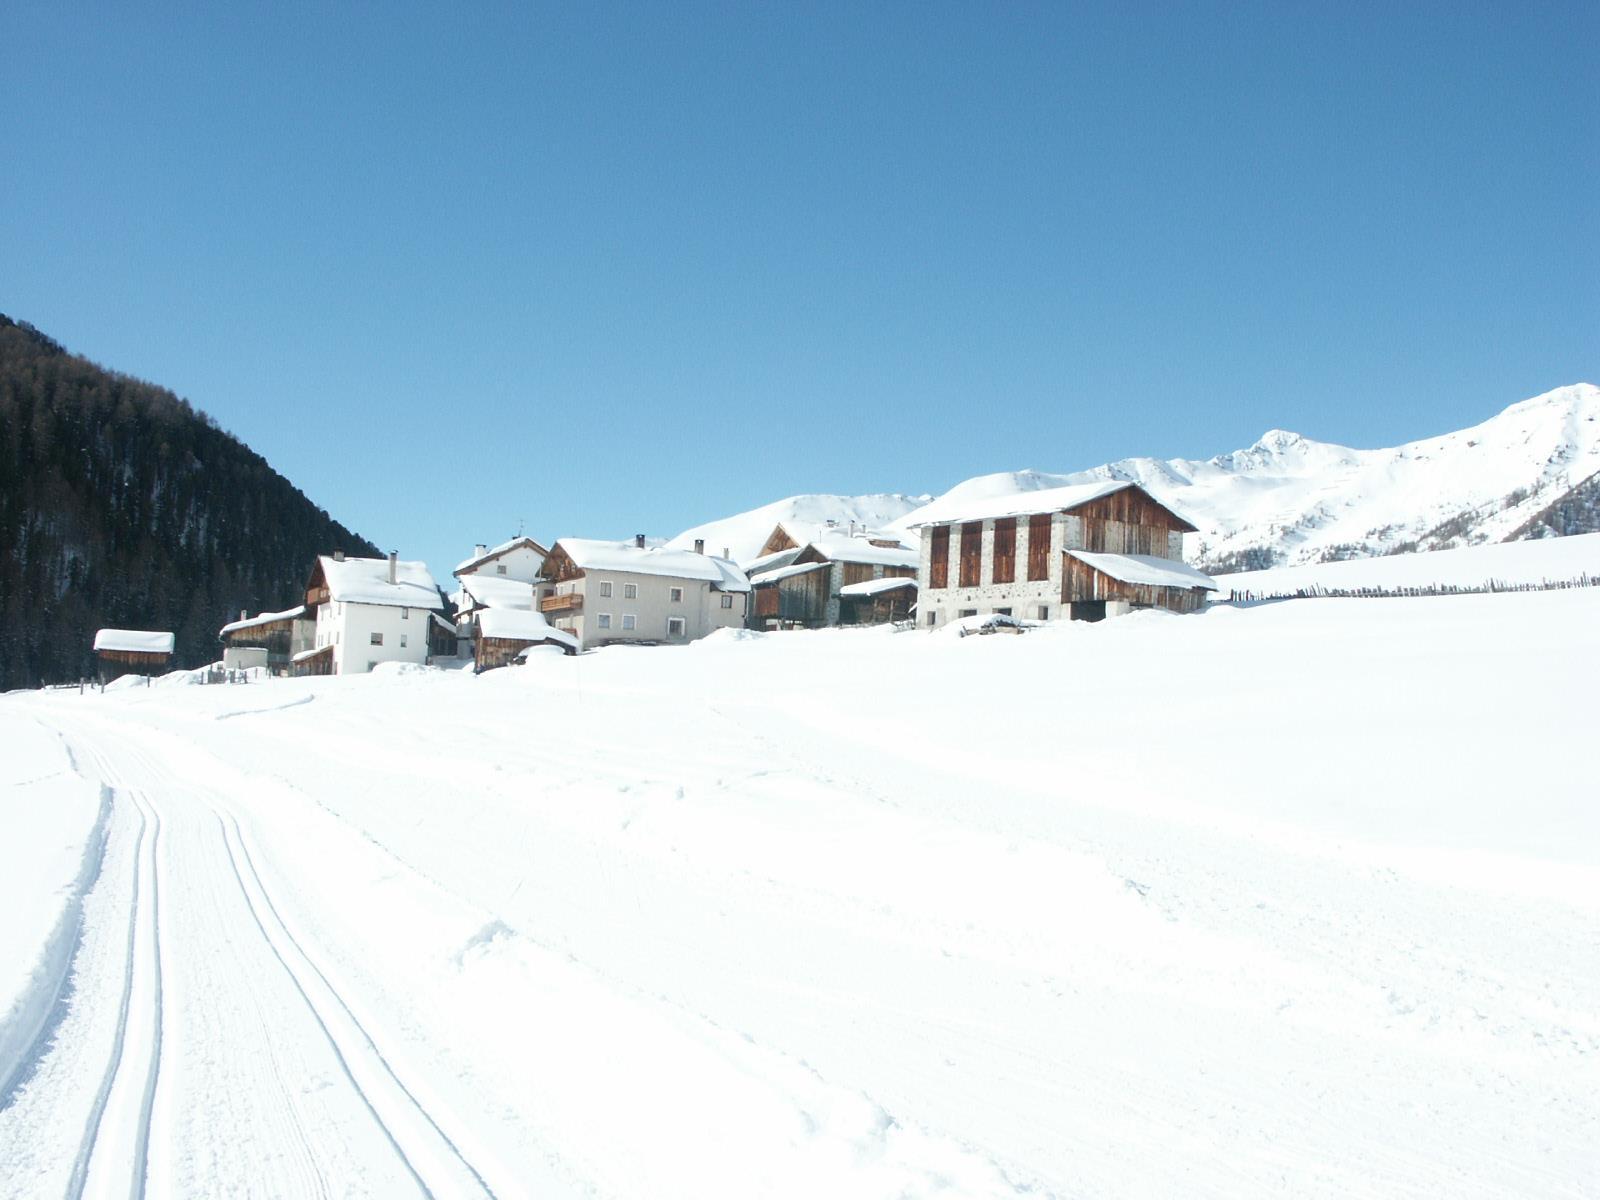 winter in Vallelunga